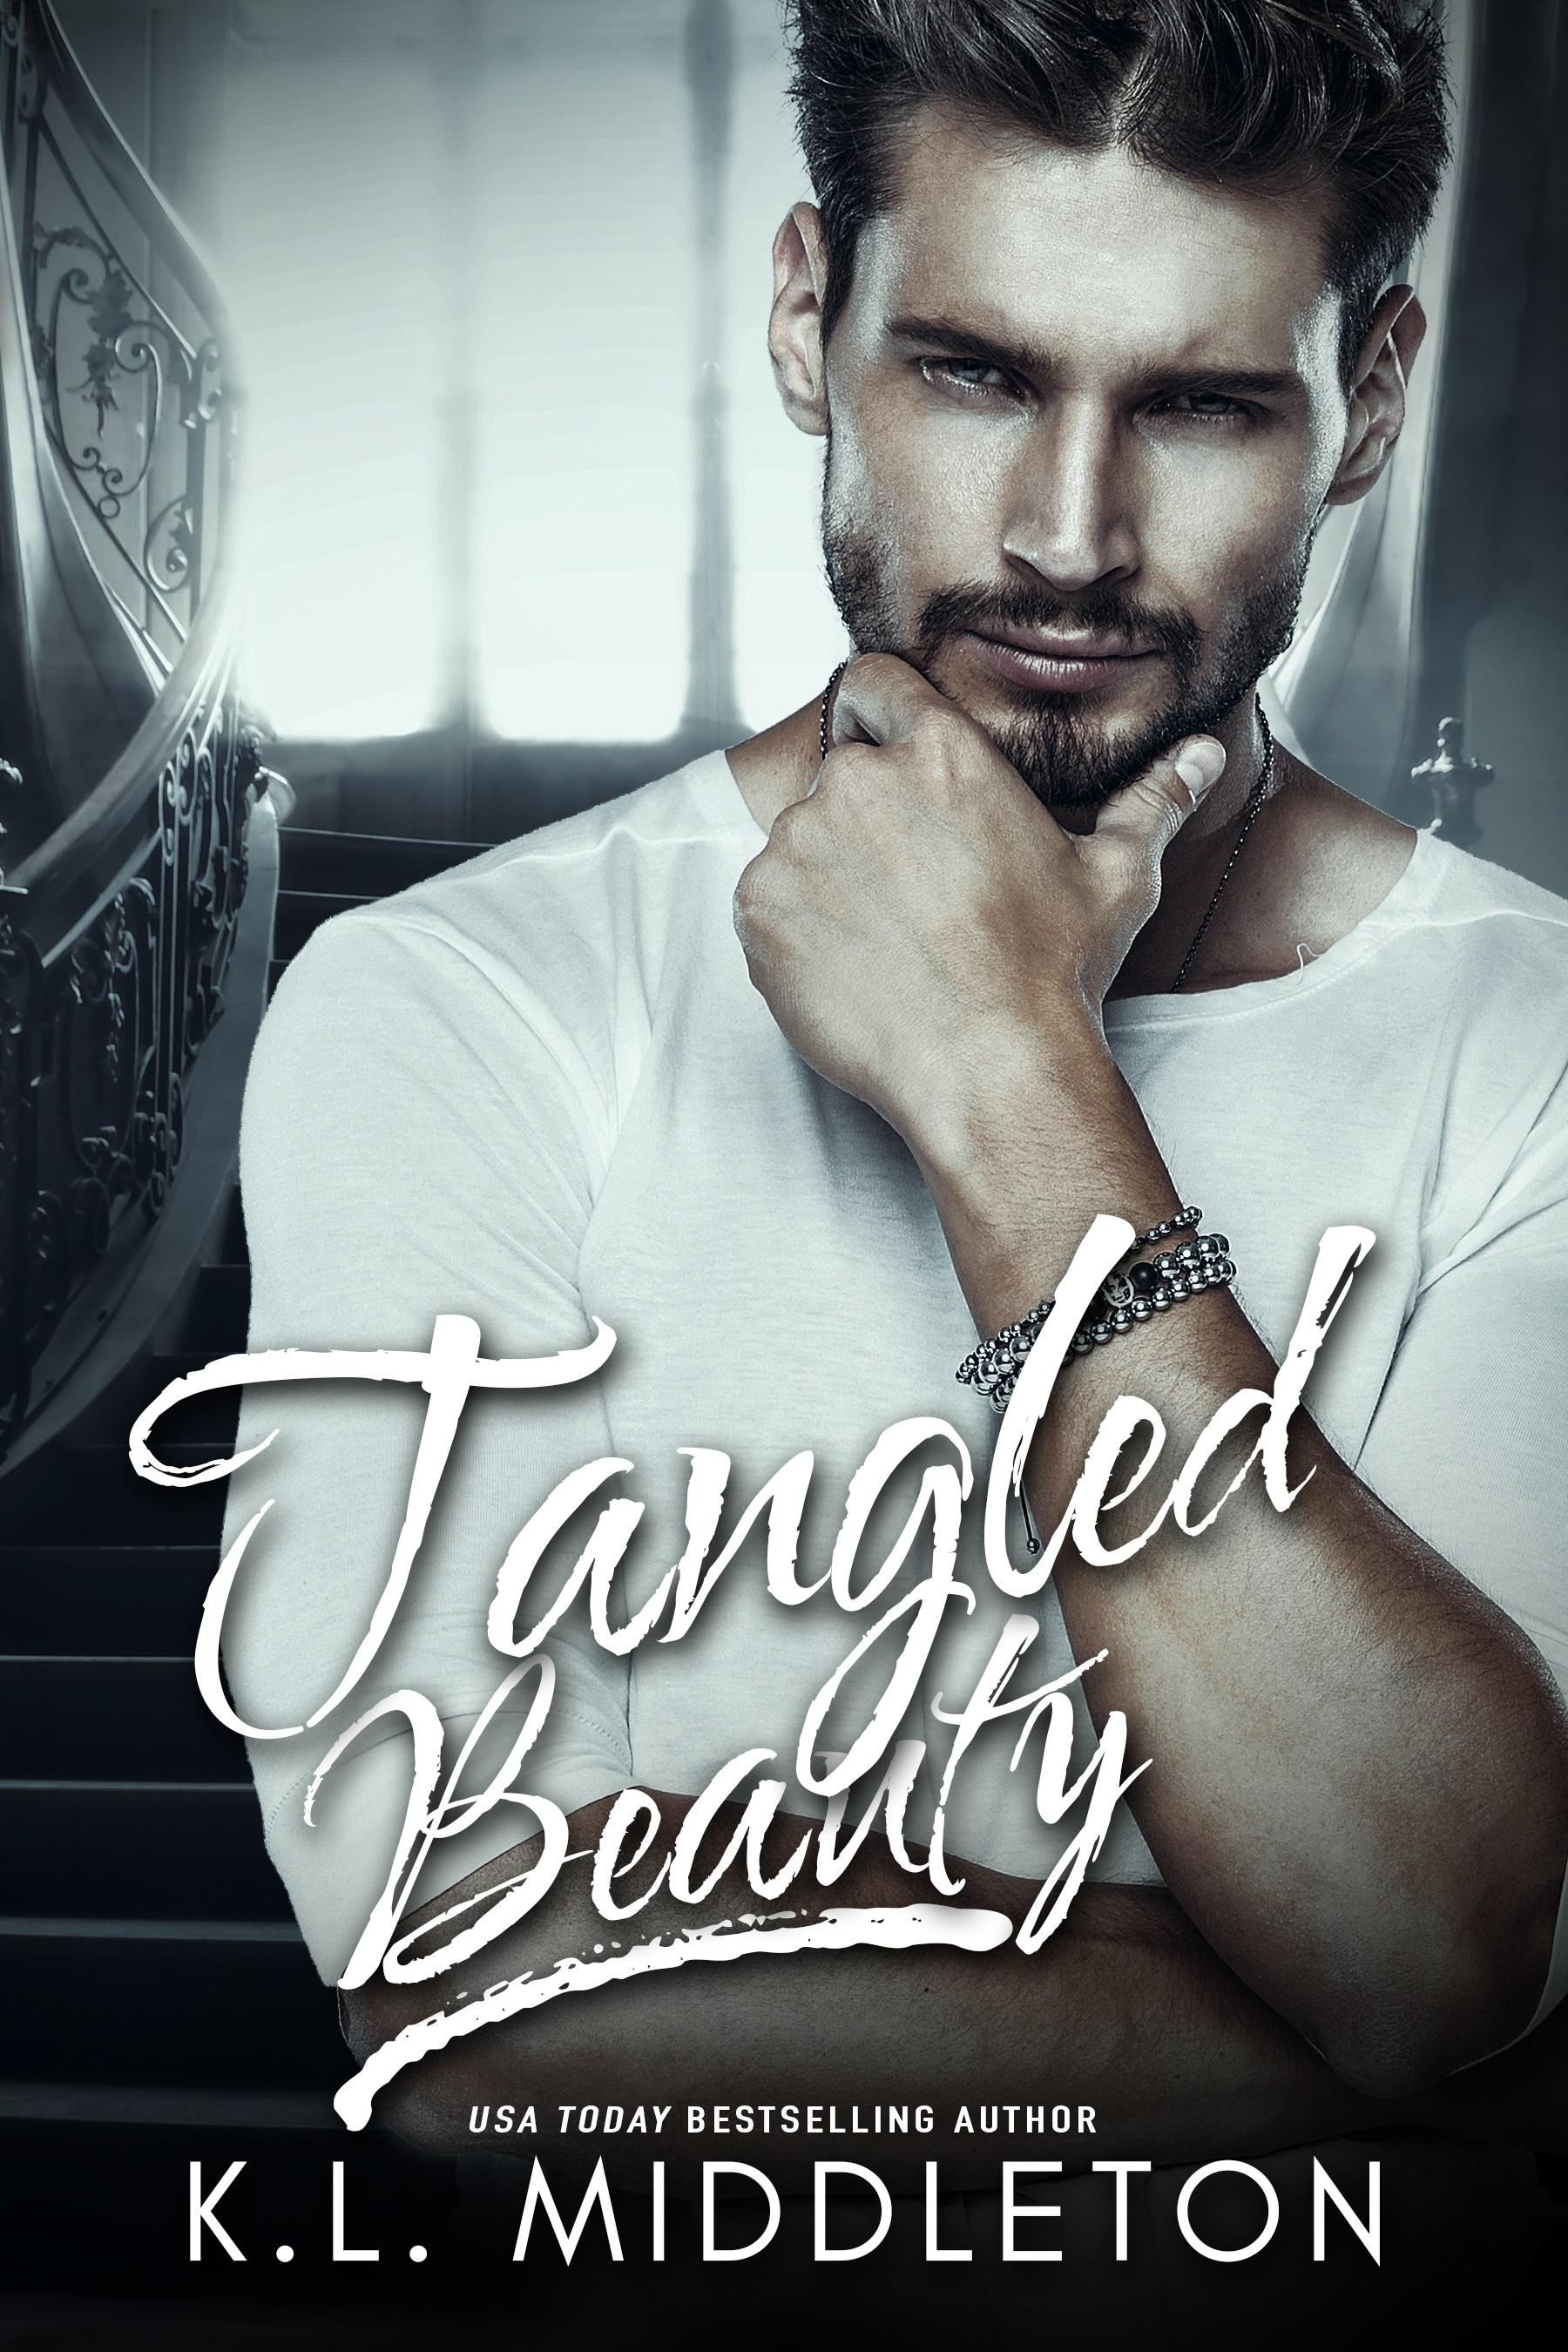 Tangled beauty